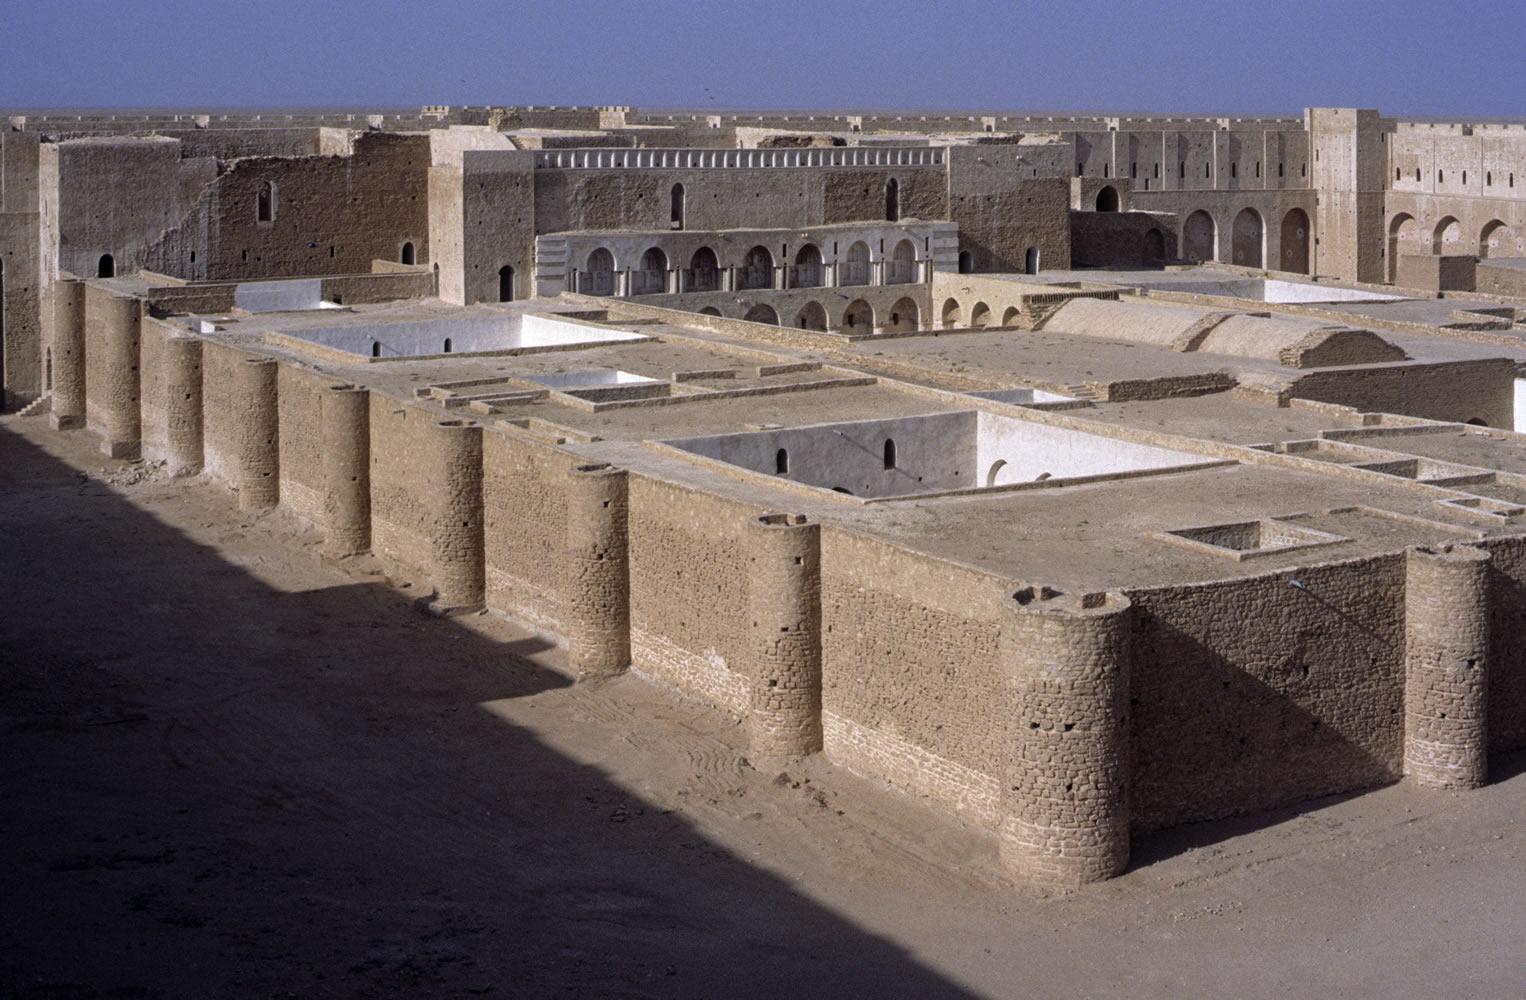 Ukhaïdir. Figura 4: un conjunto de patios